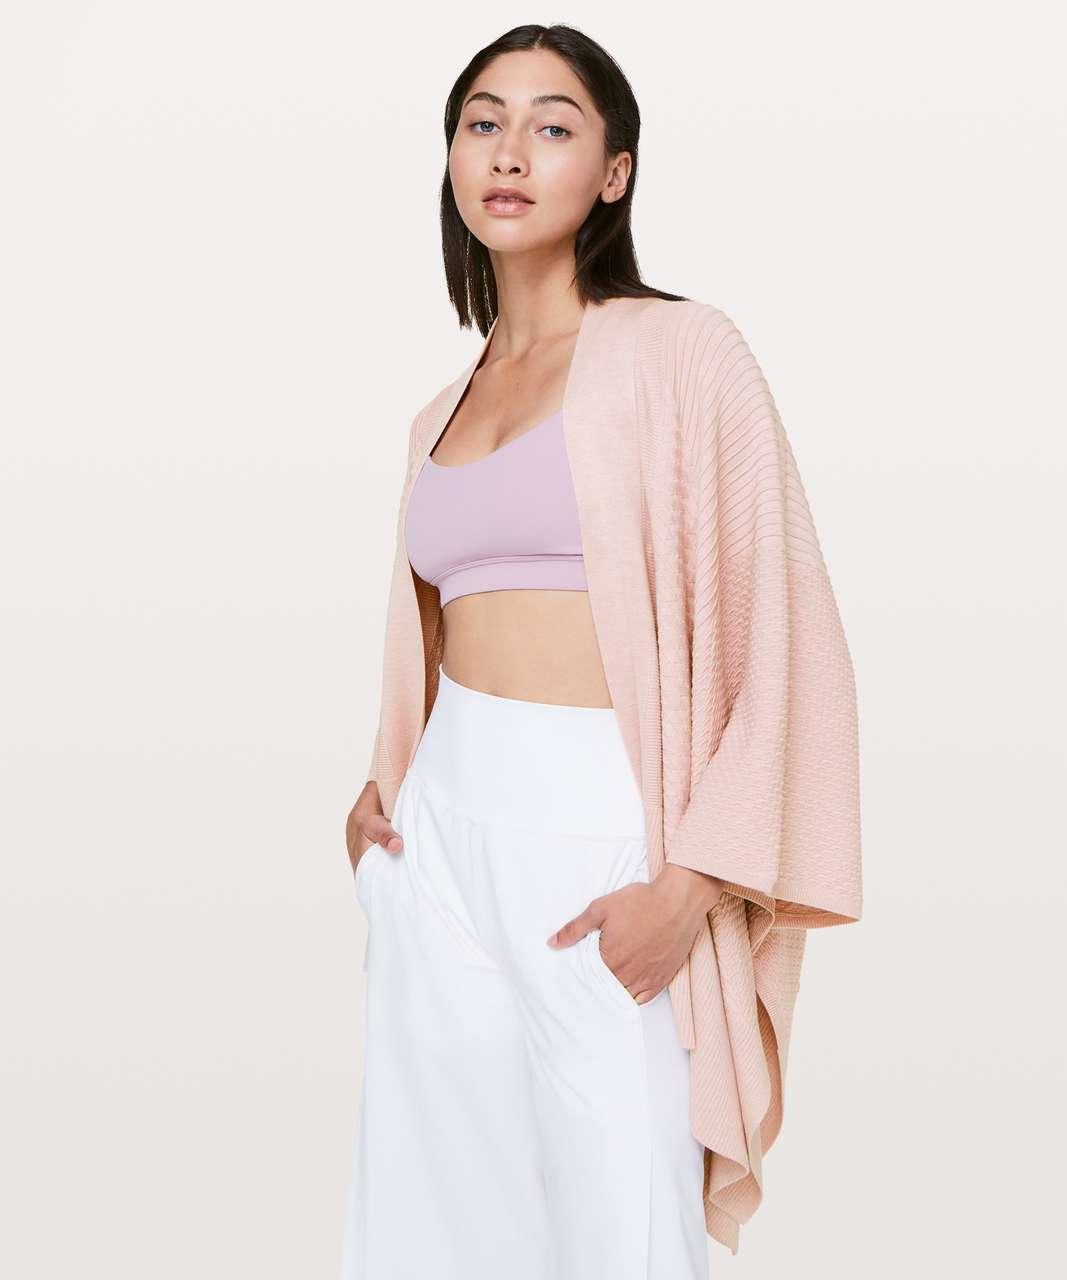 Lululemon Dream Weaver Wrap Heathered Misty Pink Lulu Fanatics